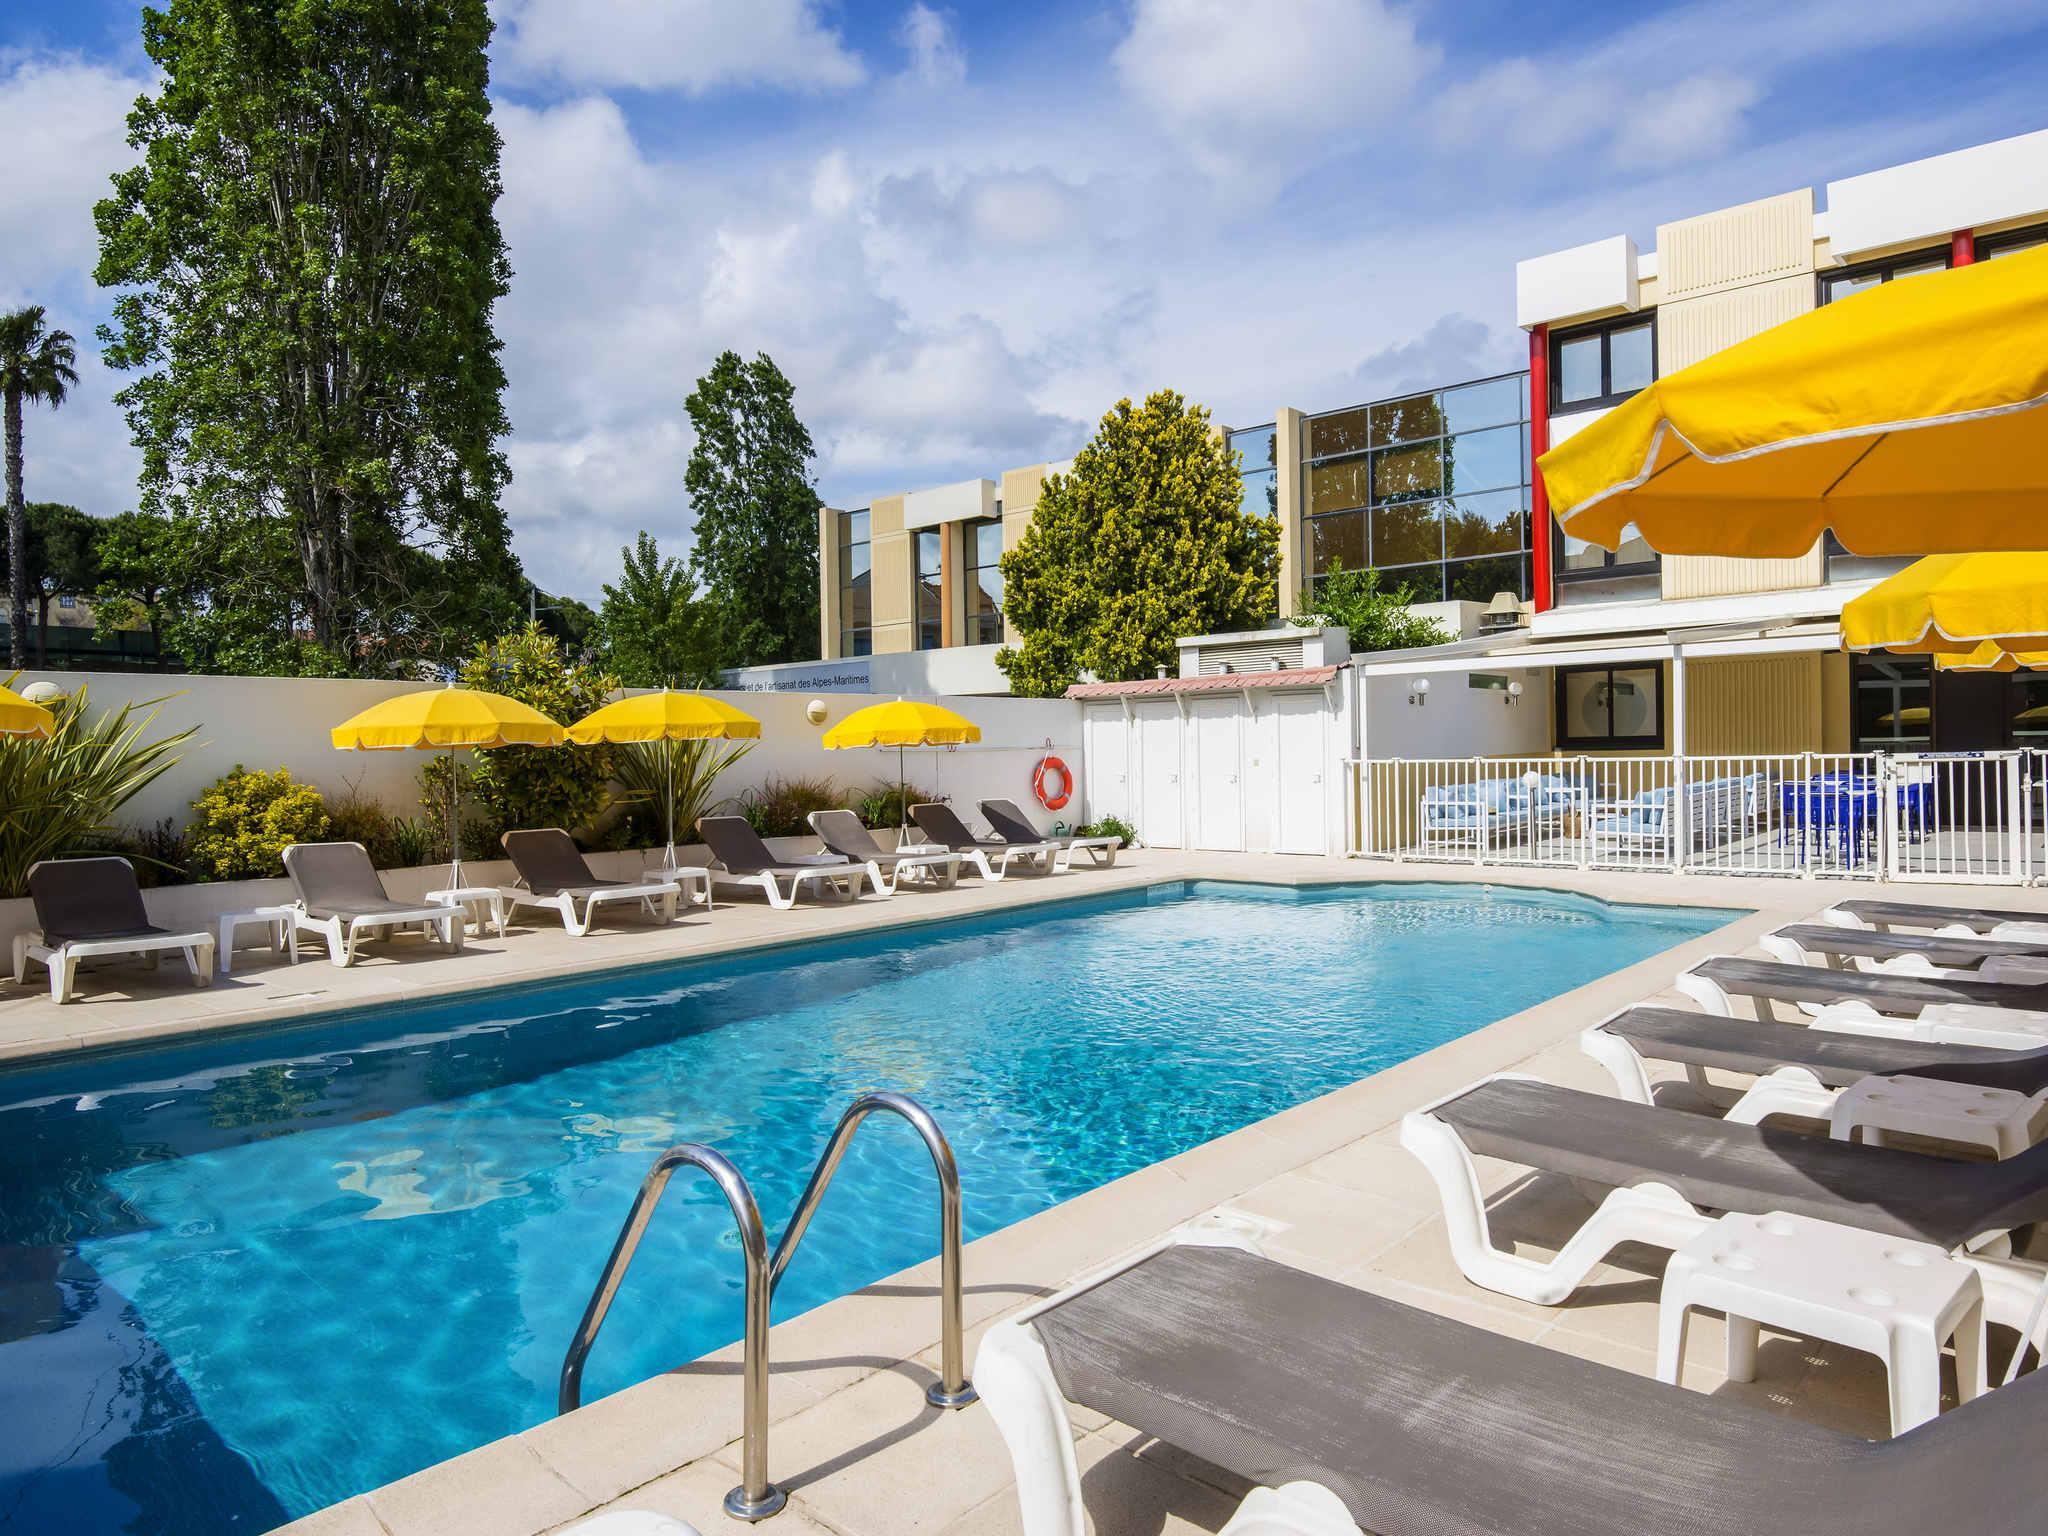 Hotel – MERCURE NICE CAP 3000 HOTEL (futuro ibis Styles)